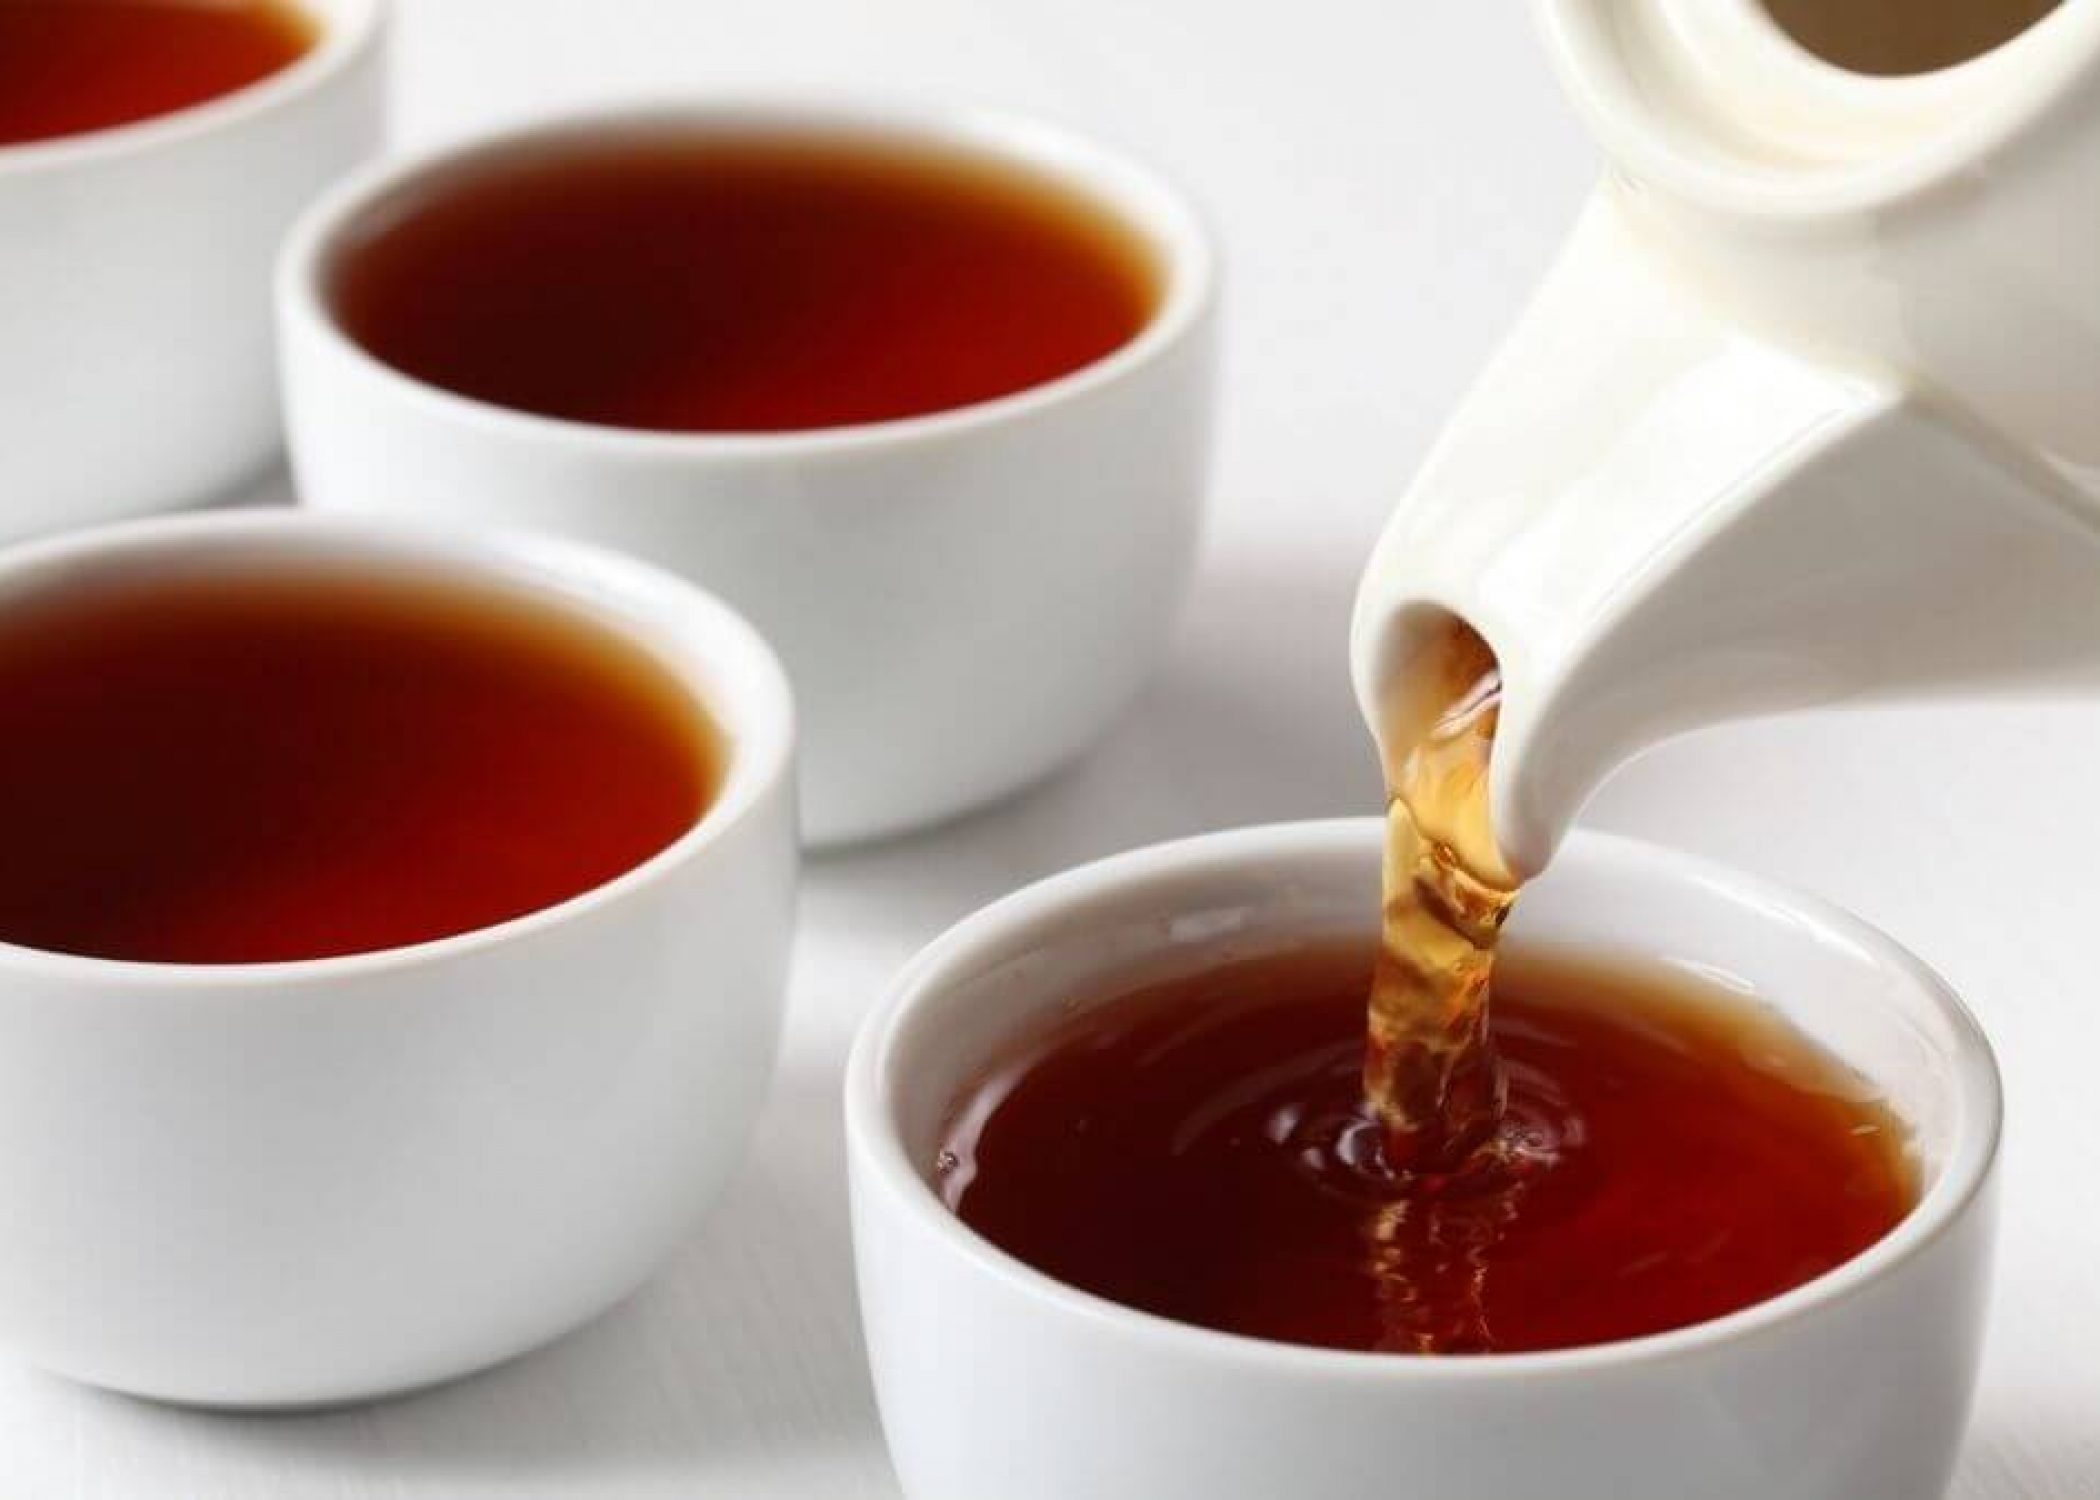 Is Black Tea Fermented?